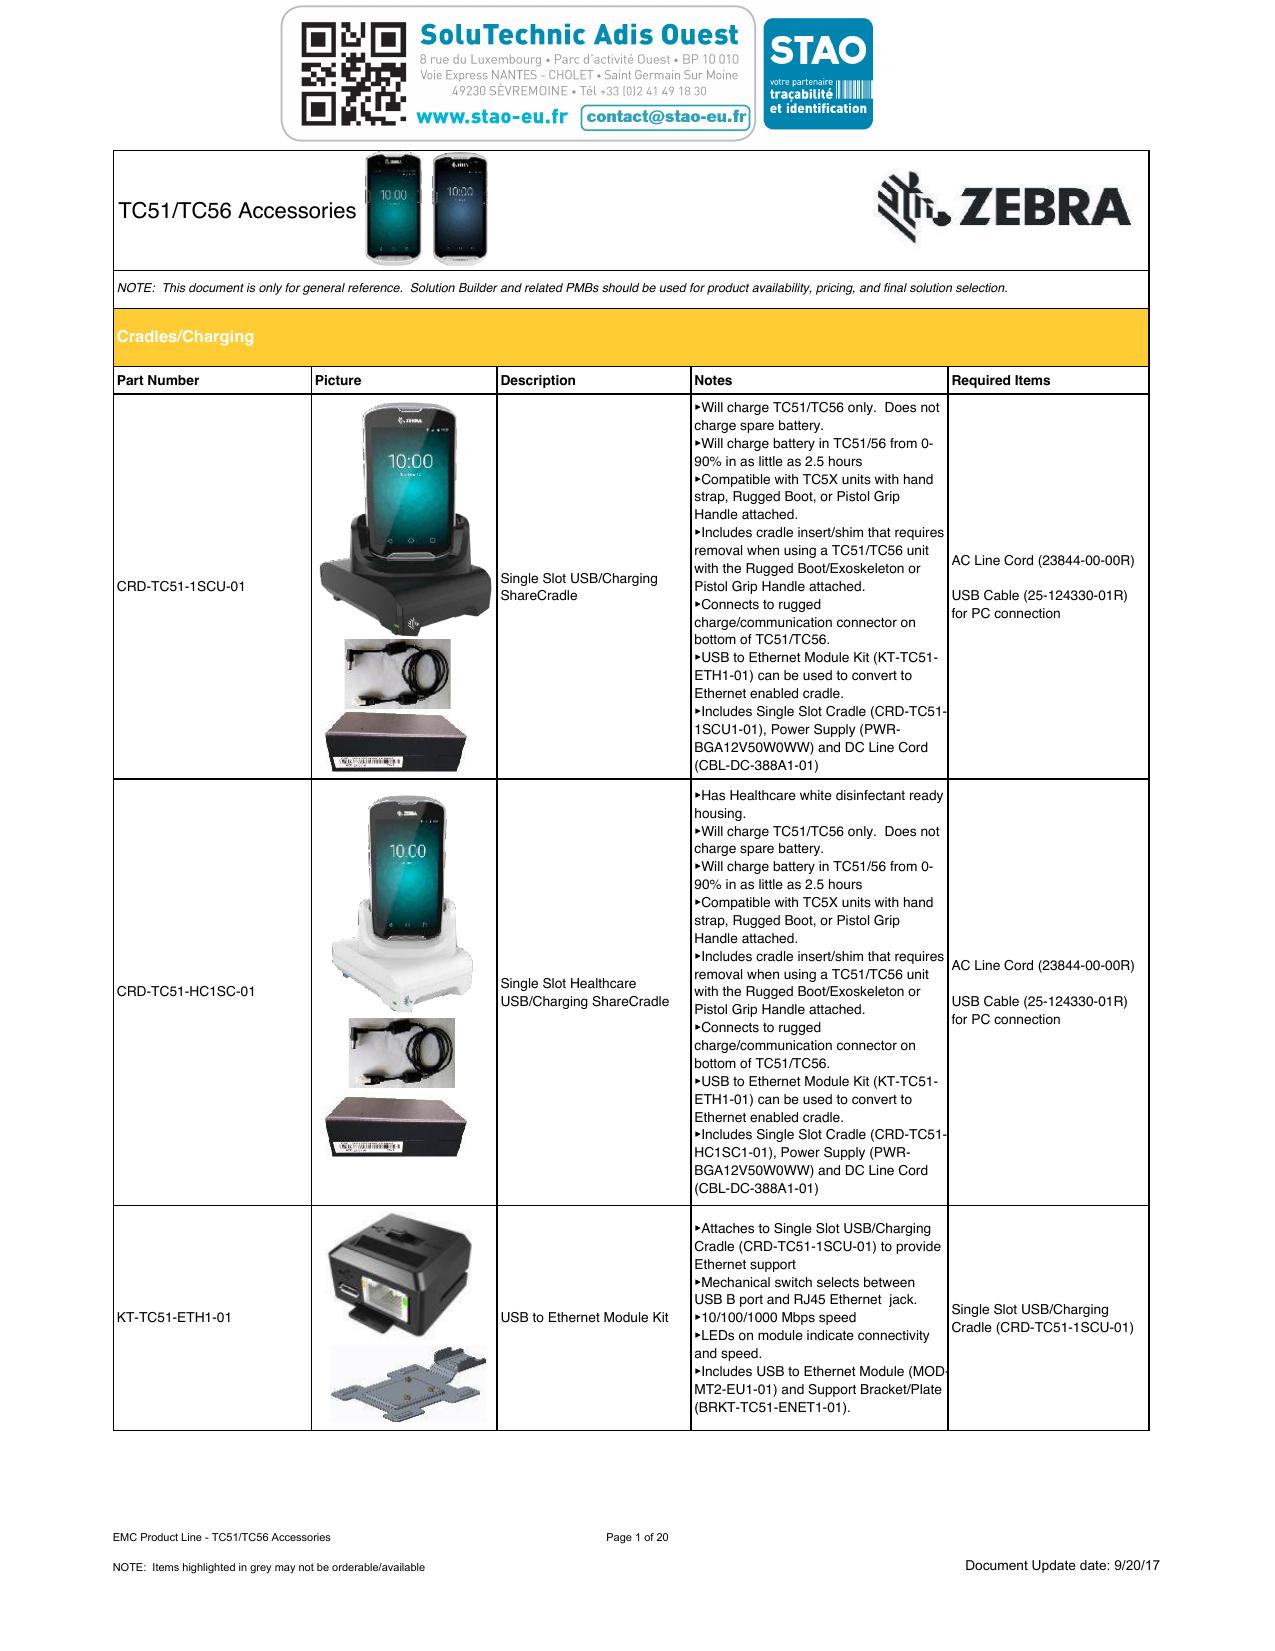 TC51/TC56 Accessories | manualzz com